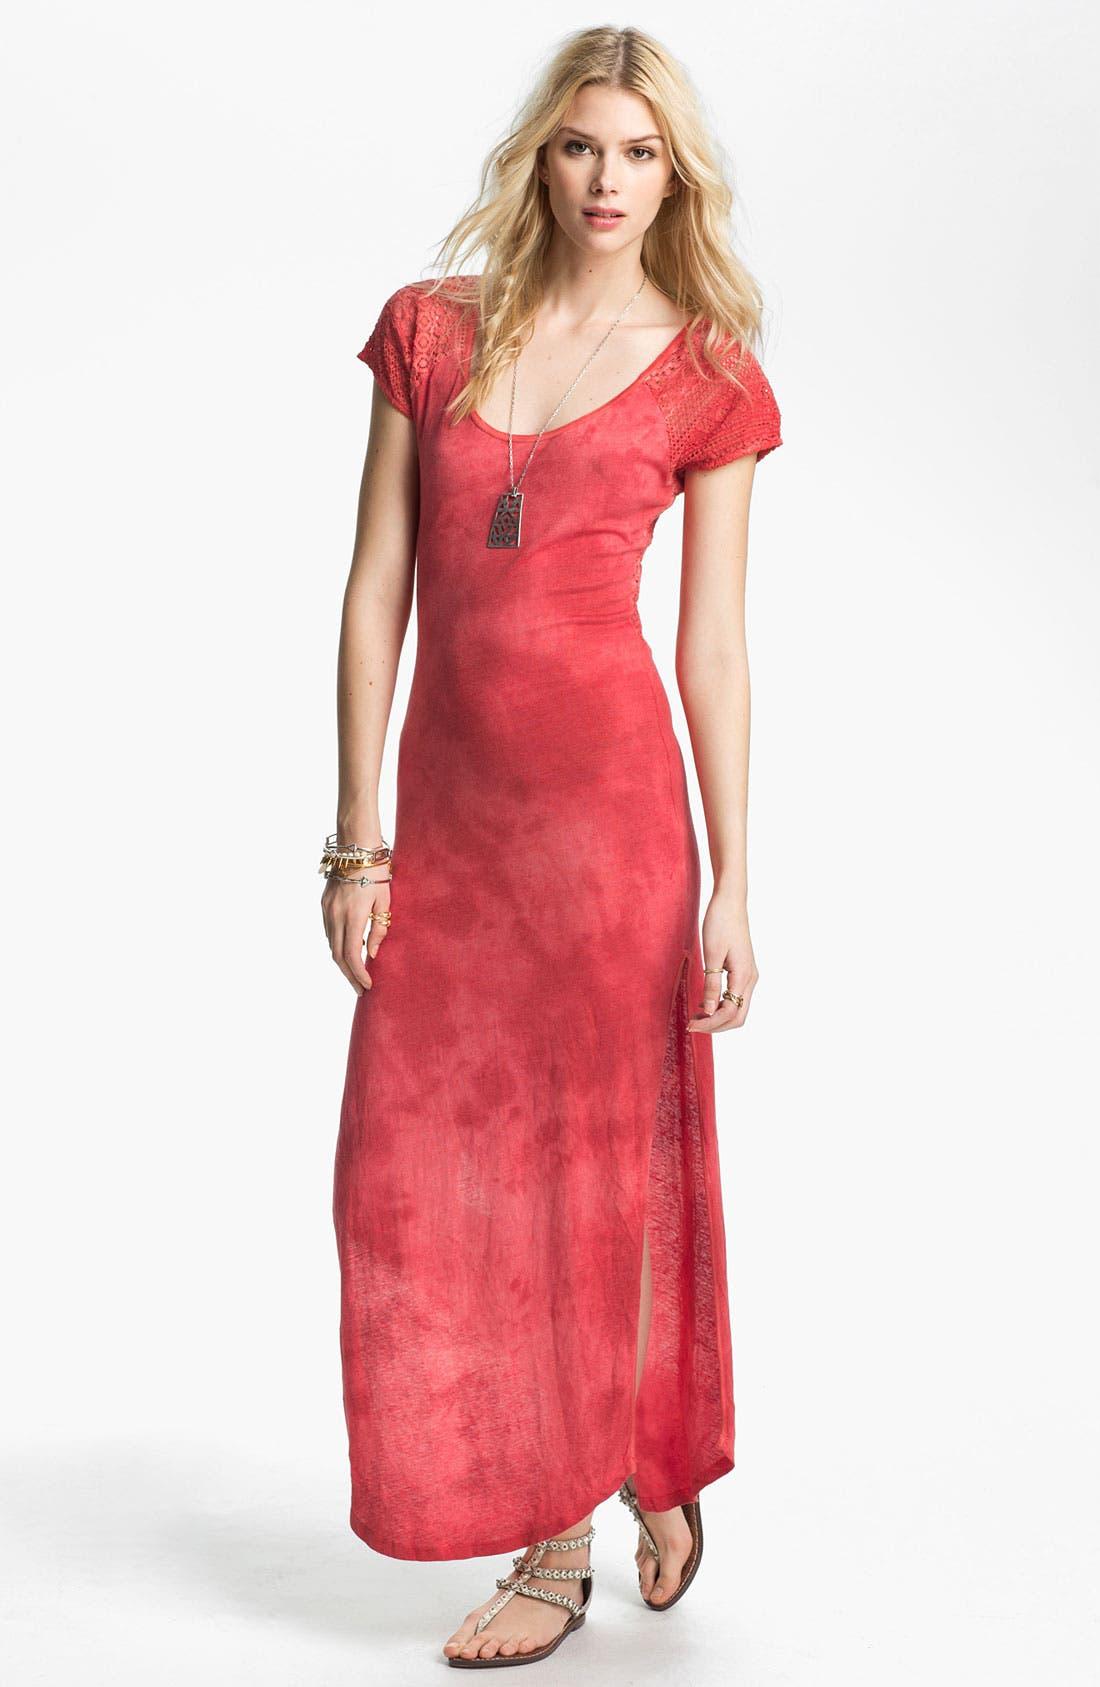 Main Image - Free People Lace Detail Tie Dye Maxi Dress